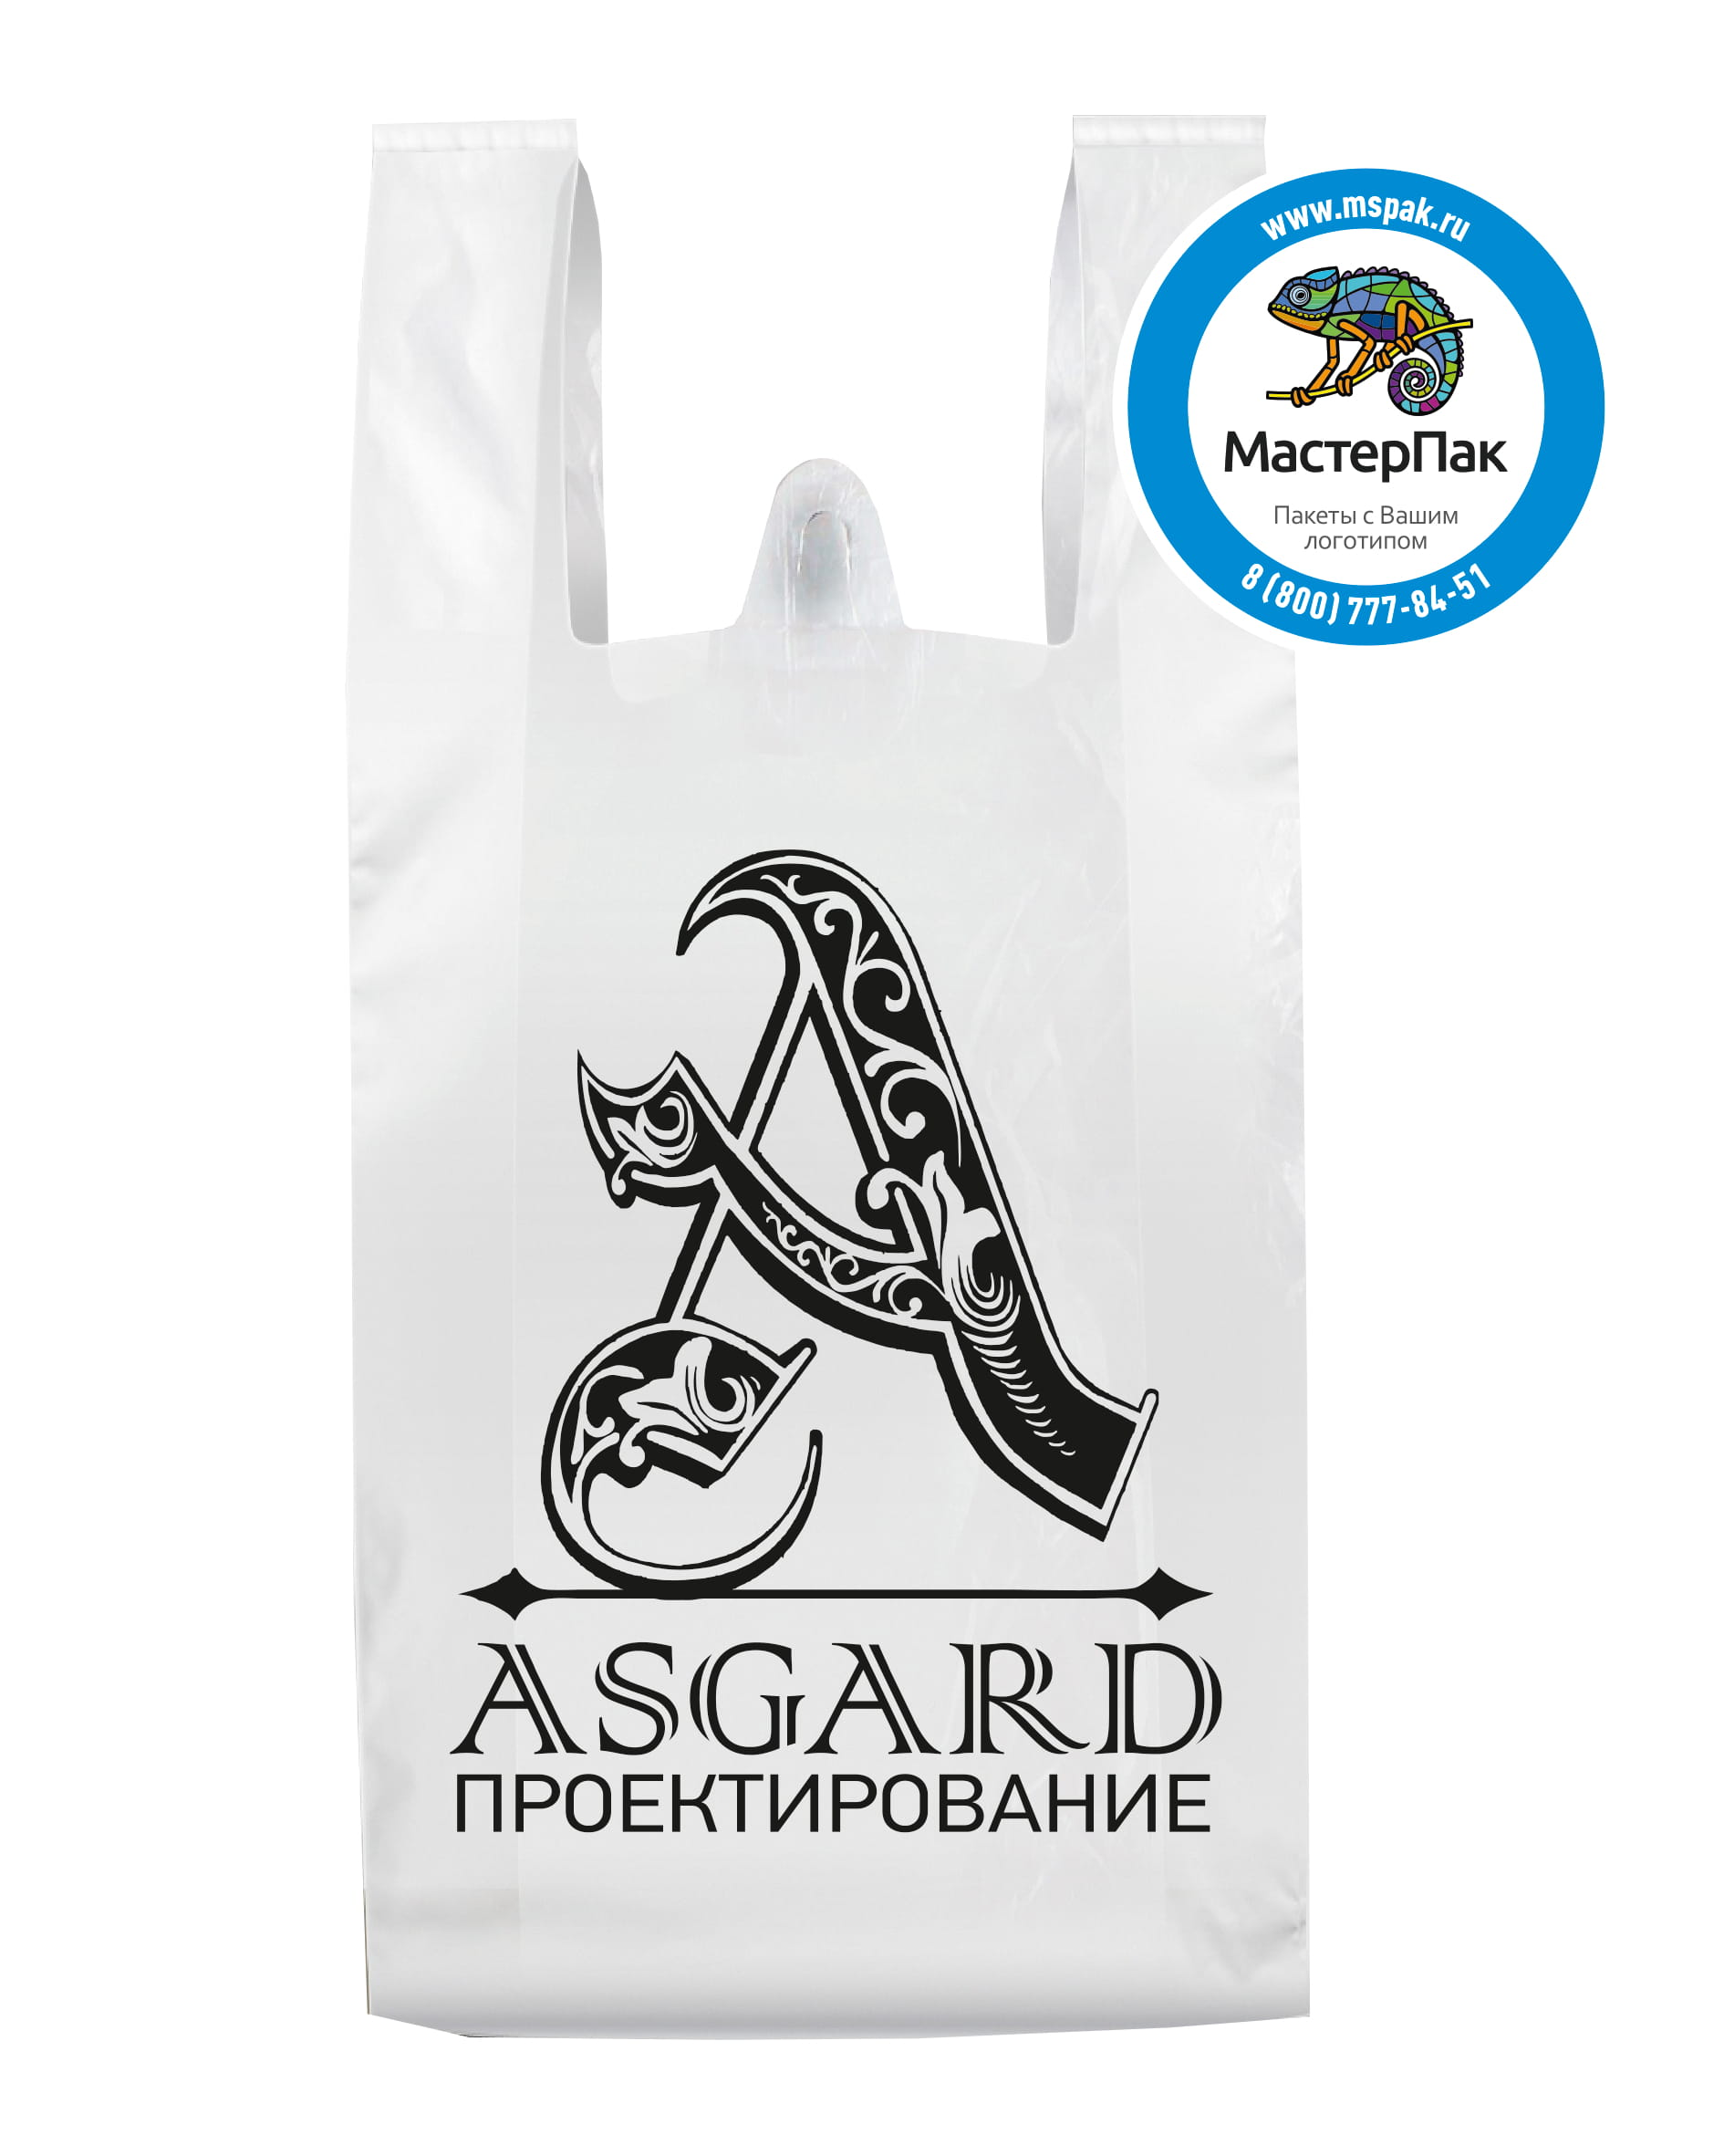 Пакет-майка ПНД, белый, с логотипом Asgard, 23 мкм, 30*60, Москва